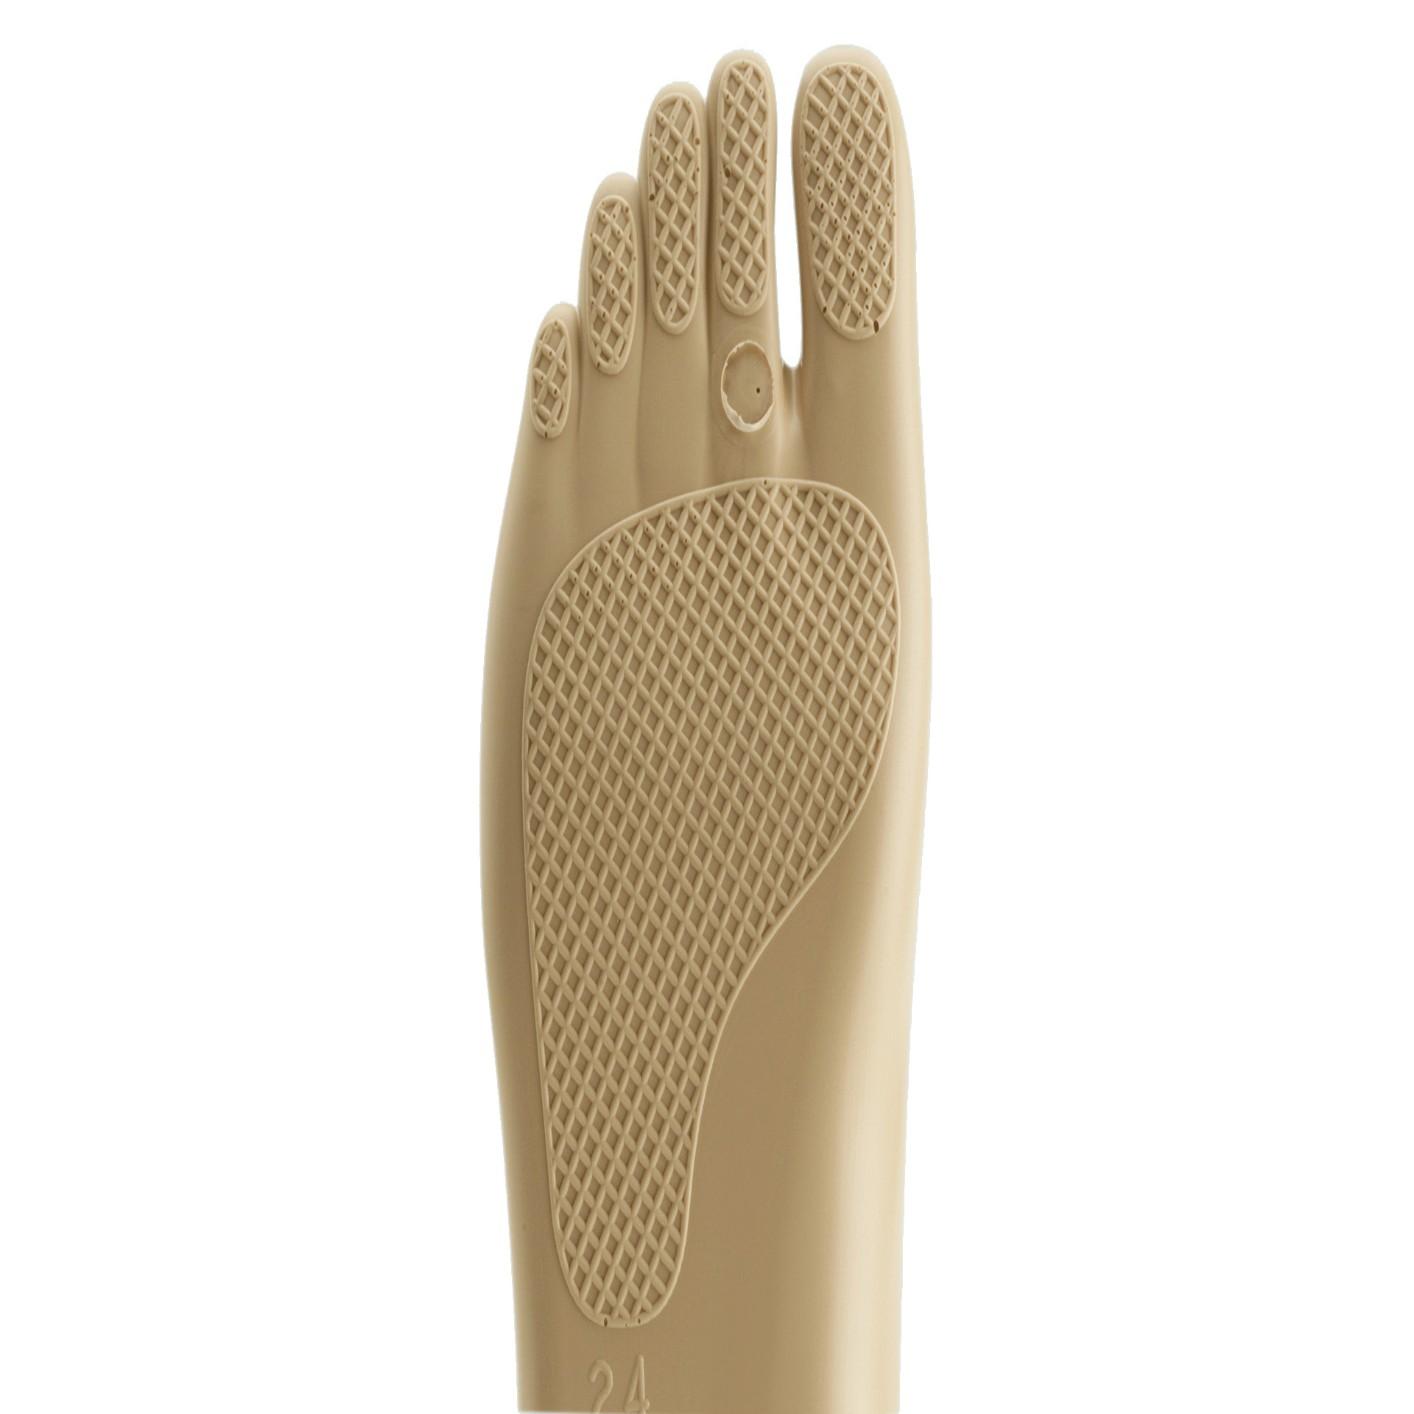 4cc527f767 Aqualine waterproof walking device